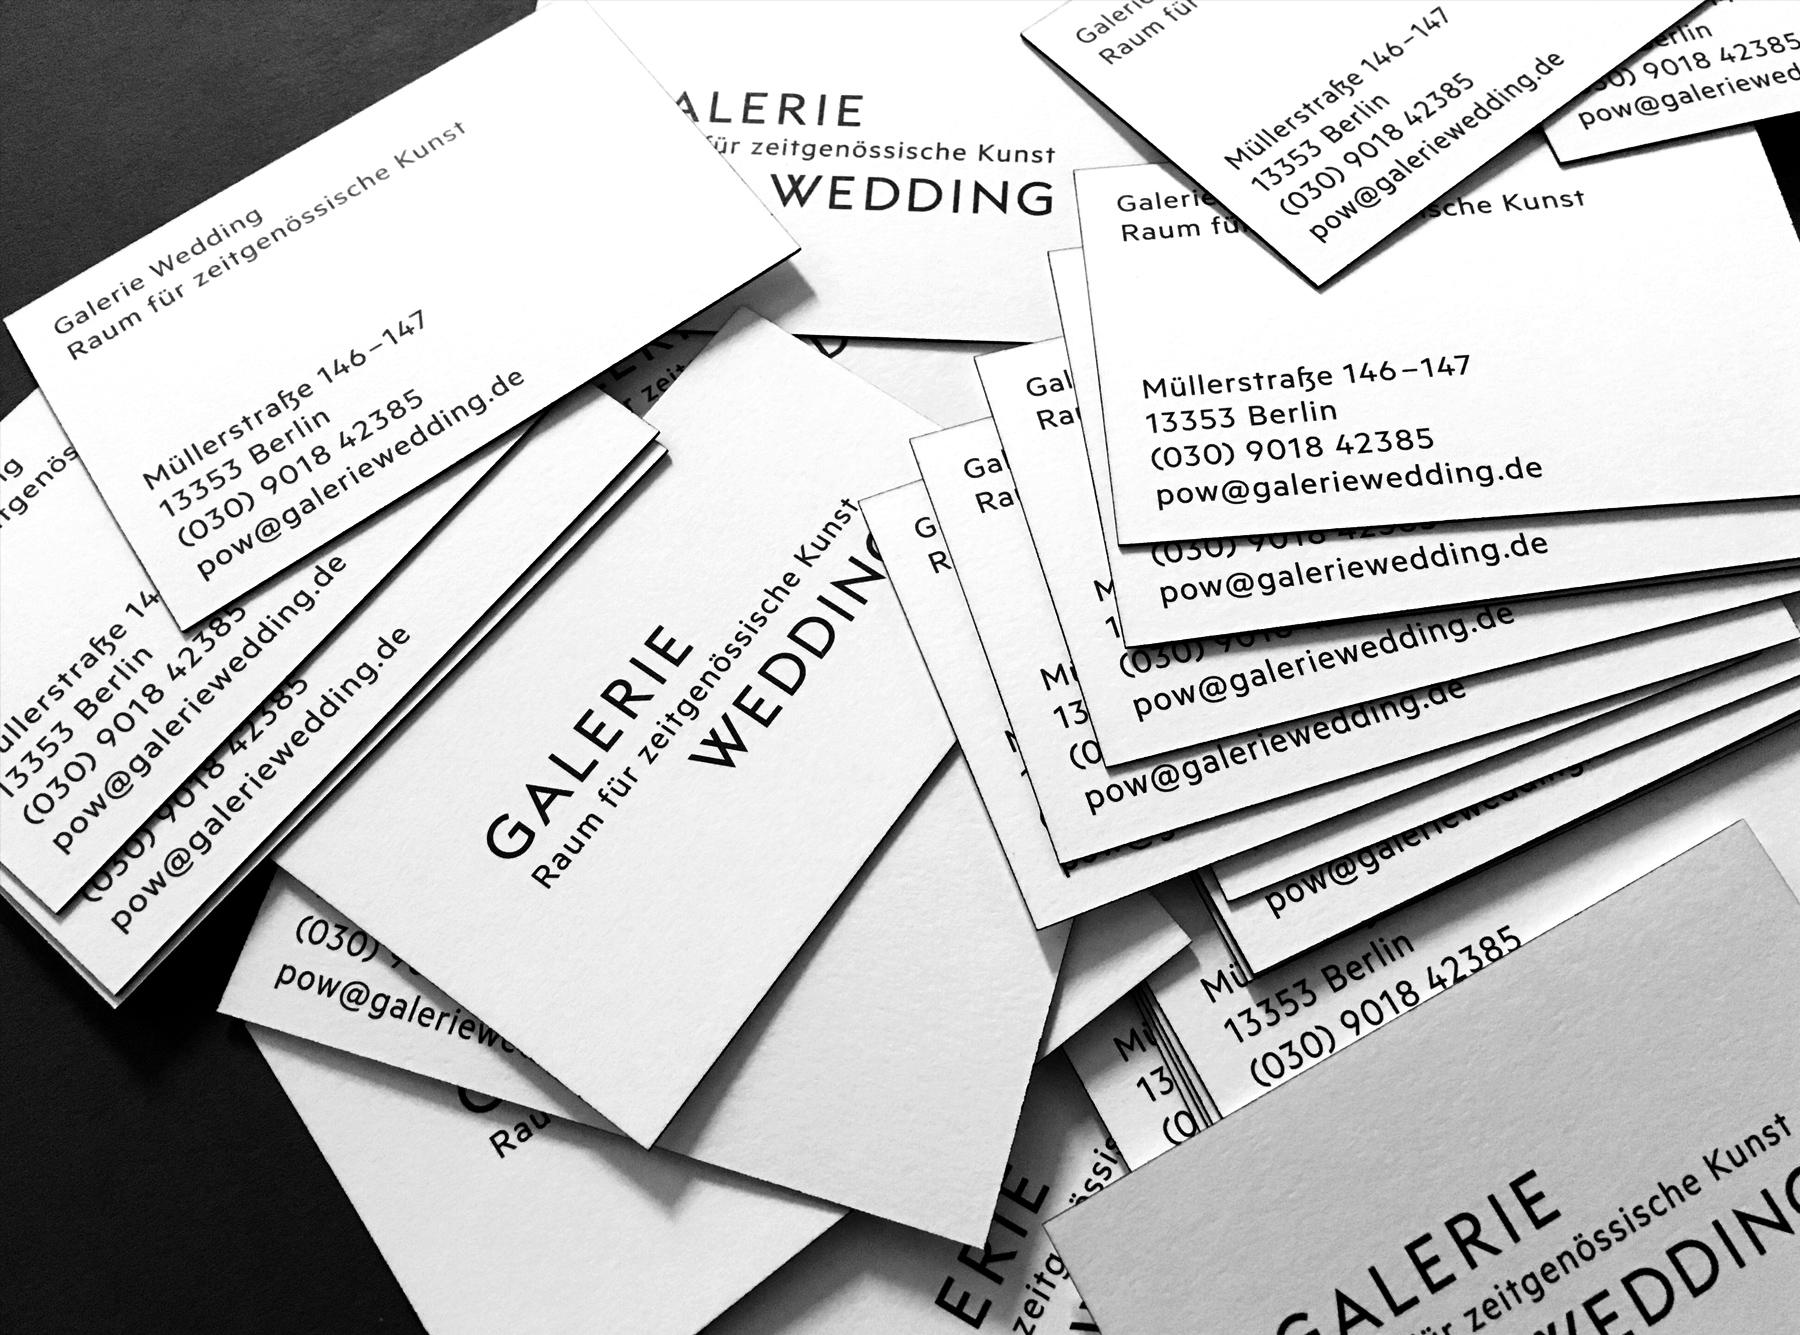 Galerie Wedding #5